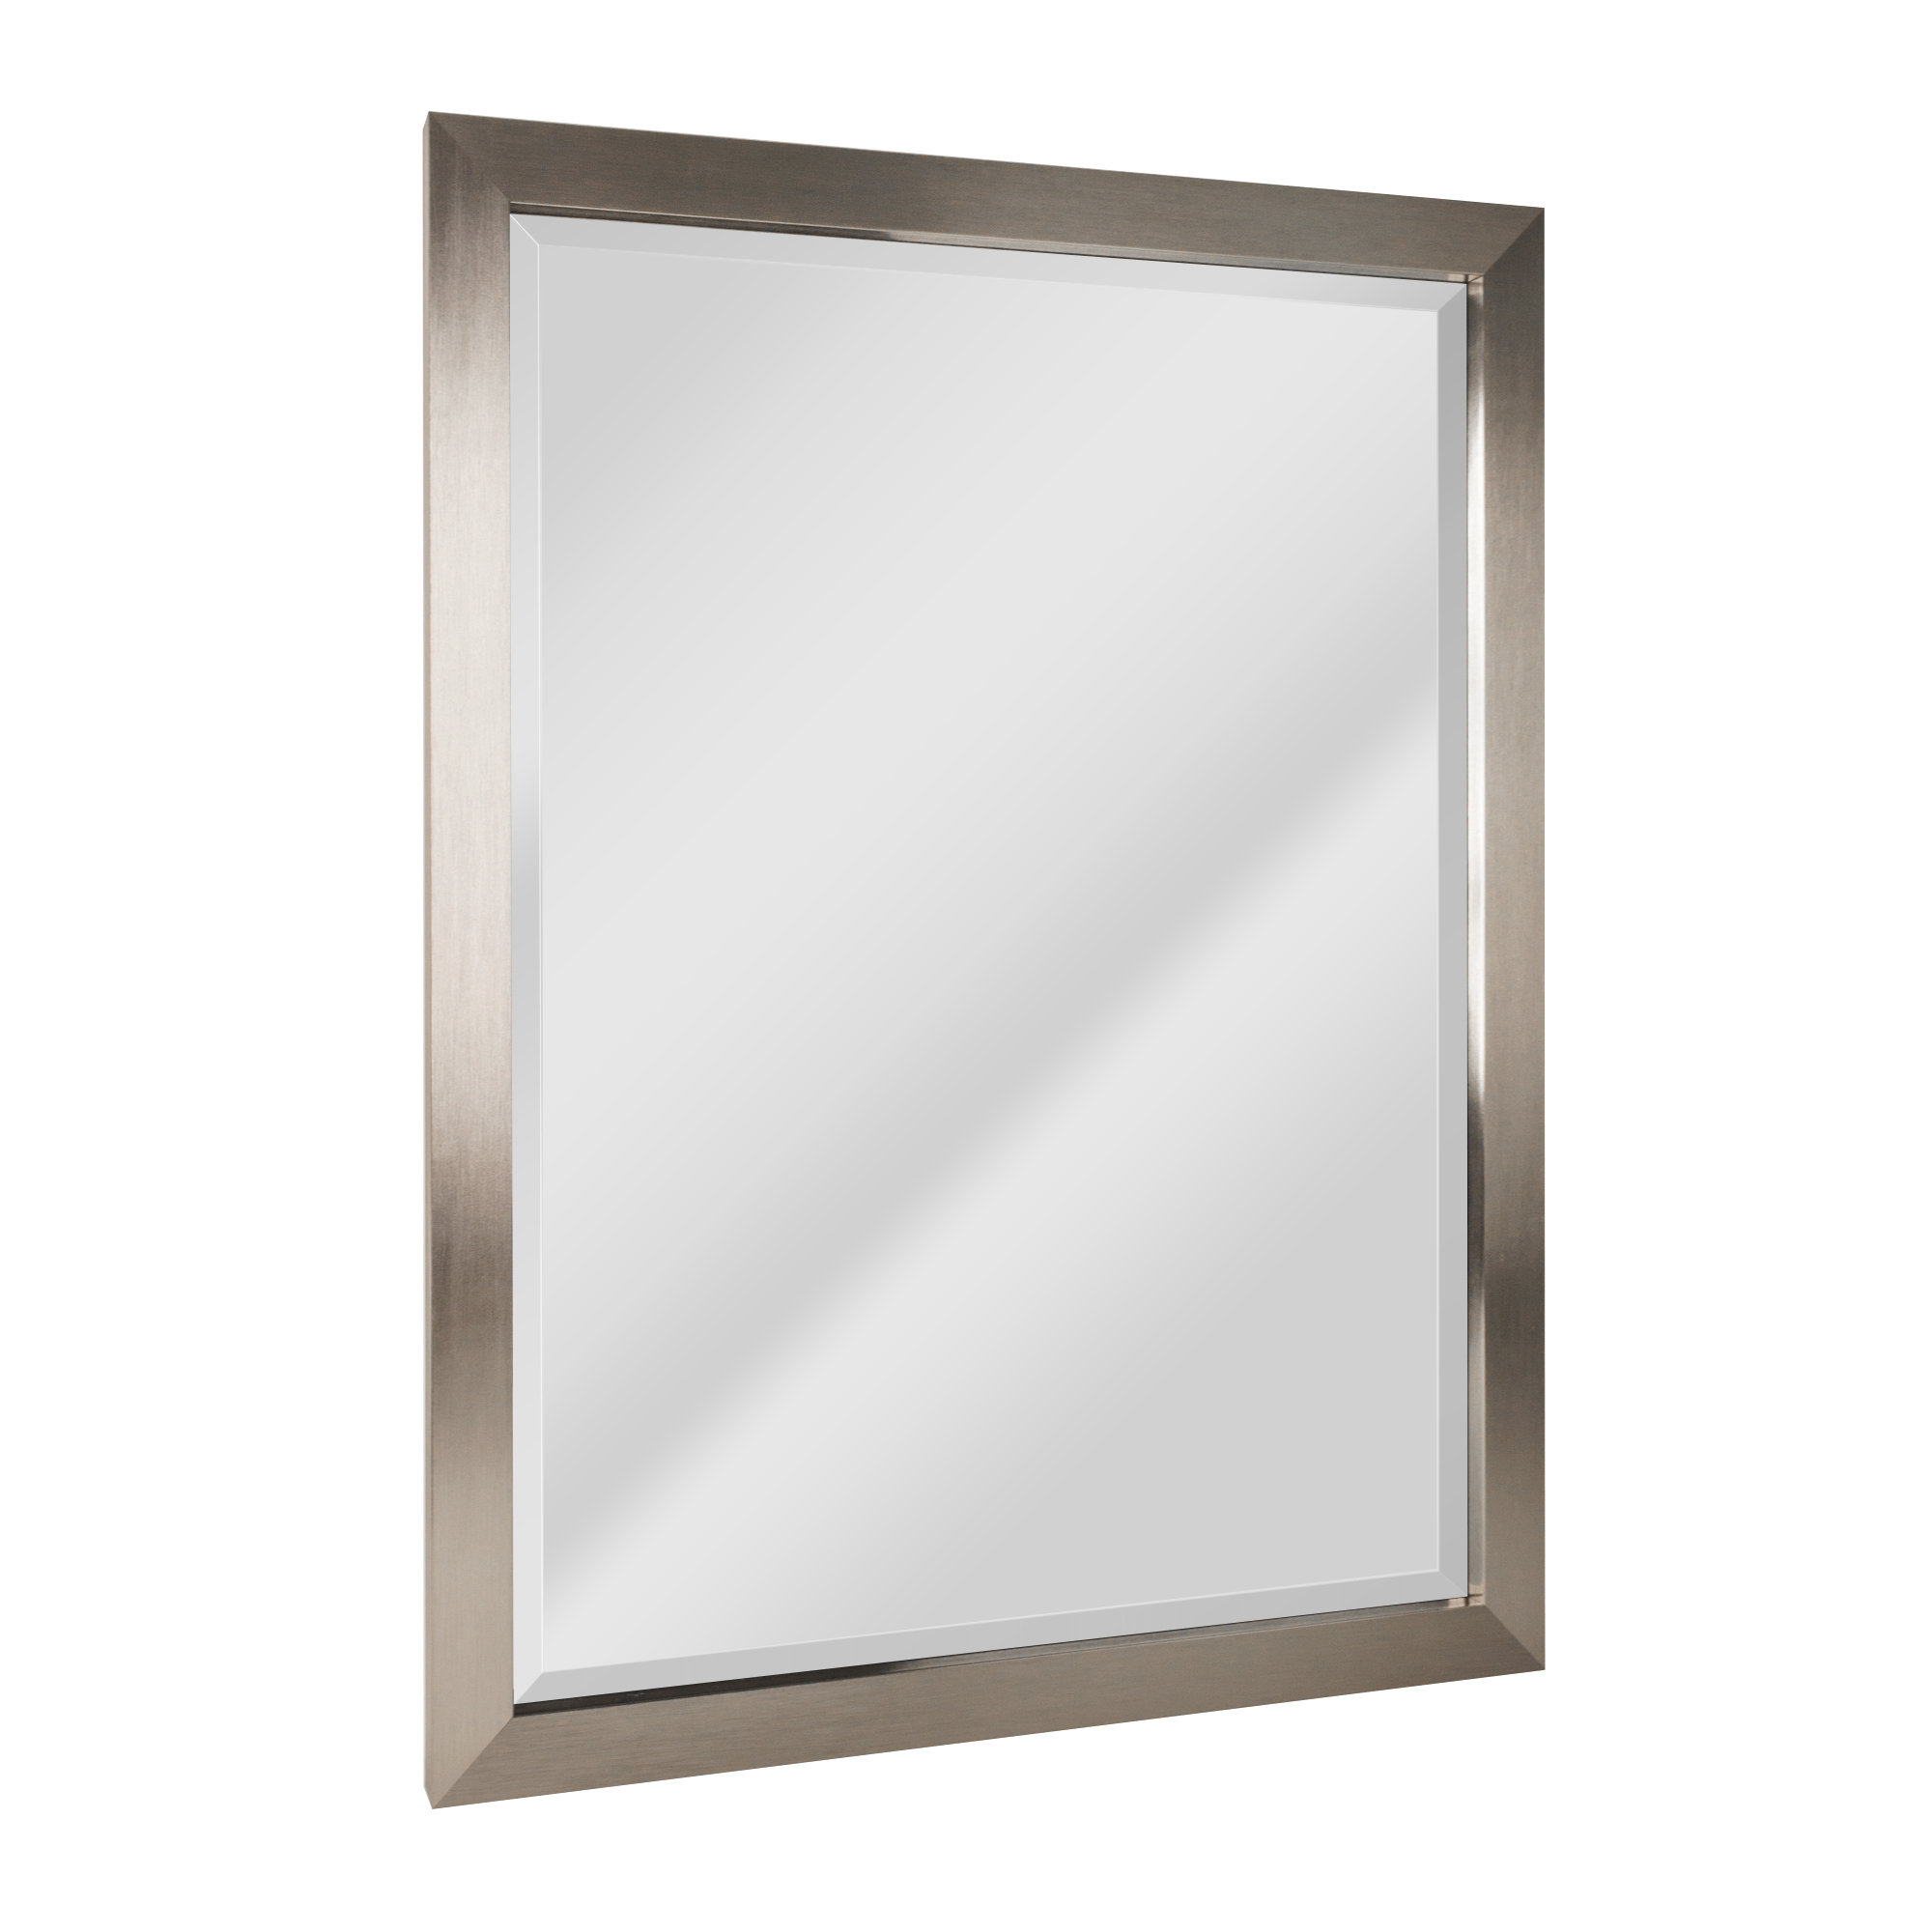 Head West Brushed Nickel Rectangular Framed Beveled Accent Wall Vanity Mirror 34 X 44 Walmart Com Walmart Com